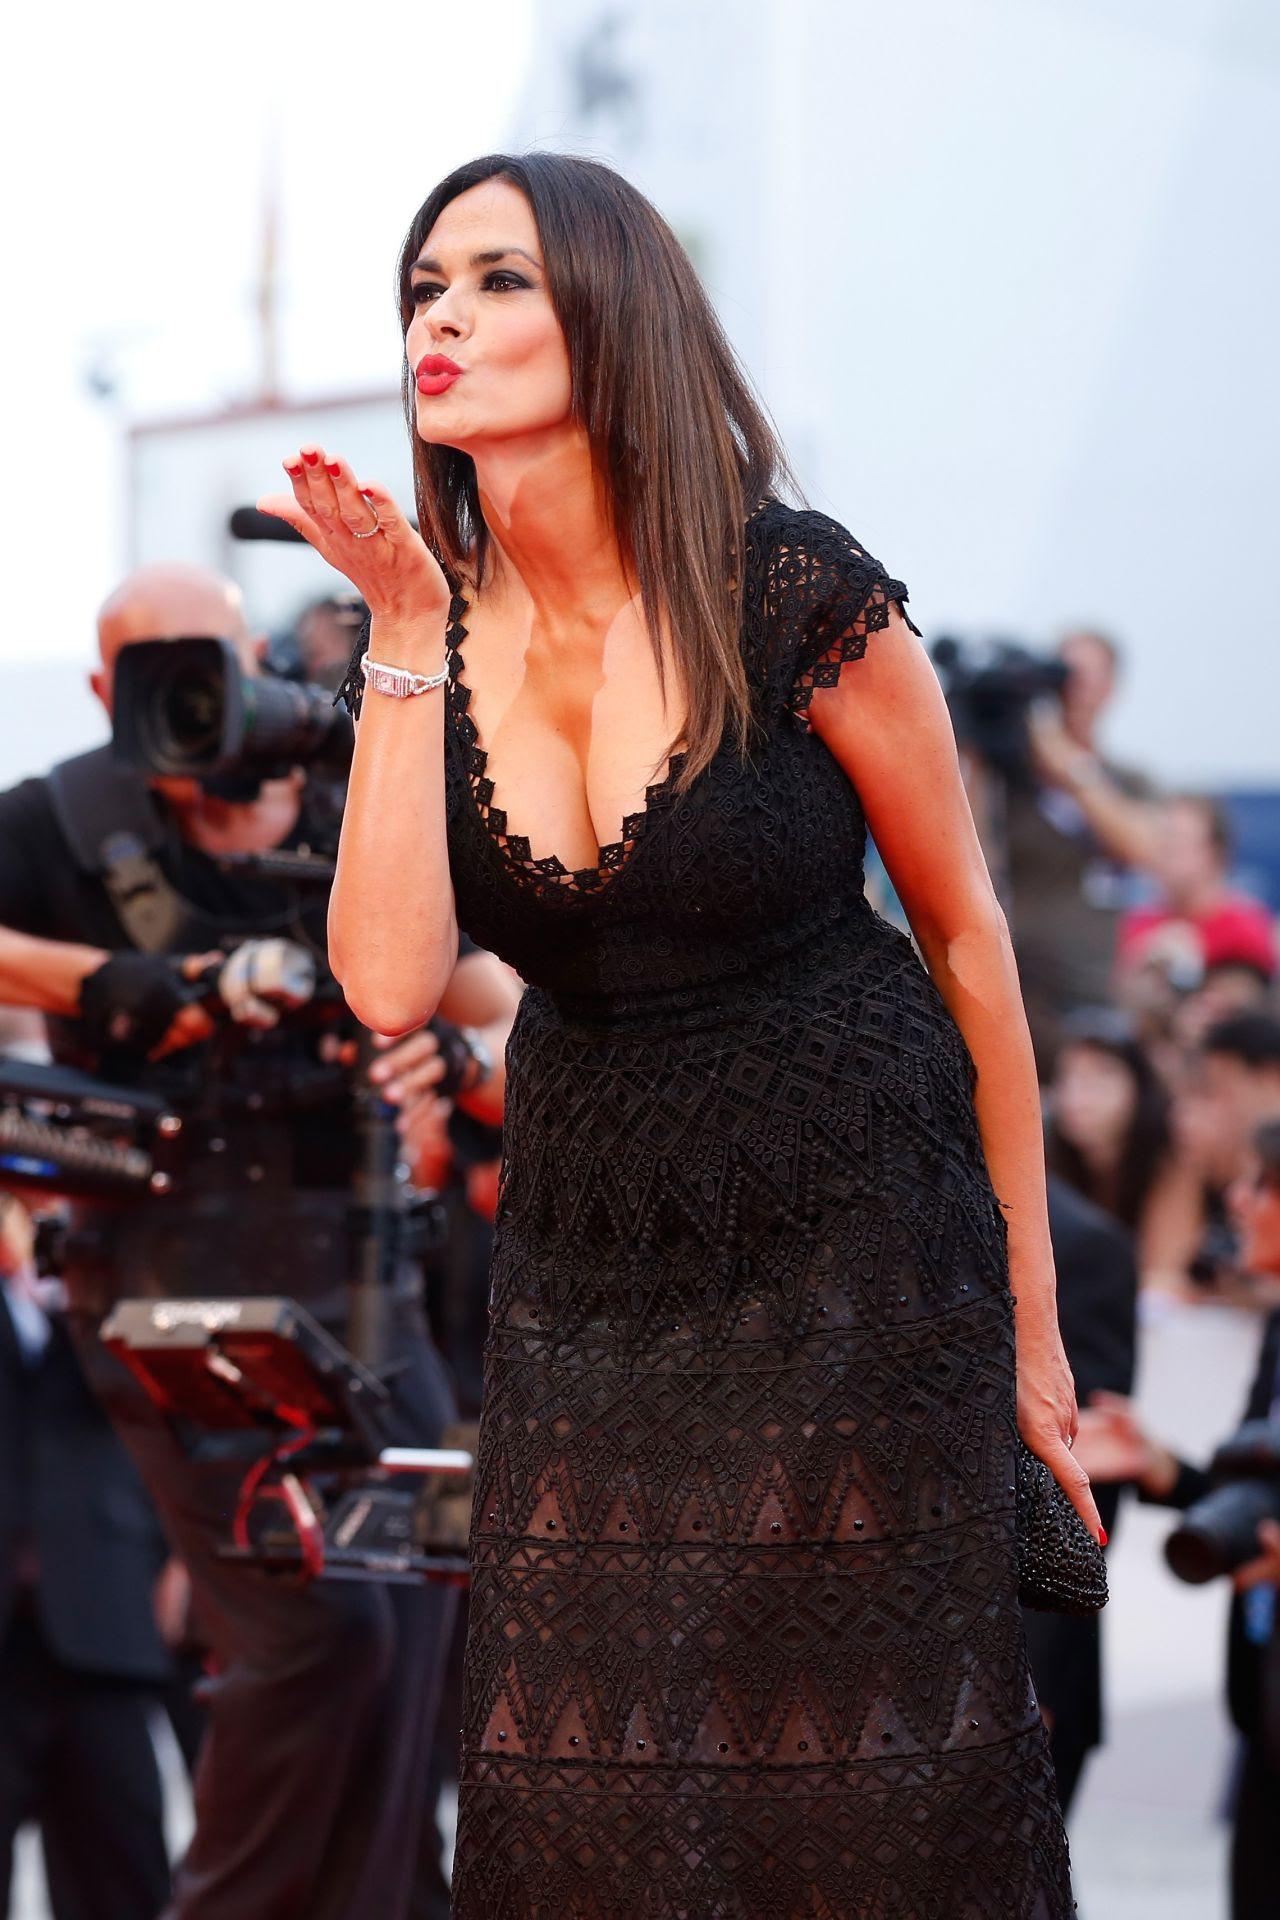 http://celebmafia.com/wp-content/uploads/2015/09/maria-grazia-cucinotta-opening-ceremony-and-premiere-of-everest-2015-venice-film-festival_9.jpg